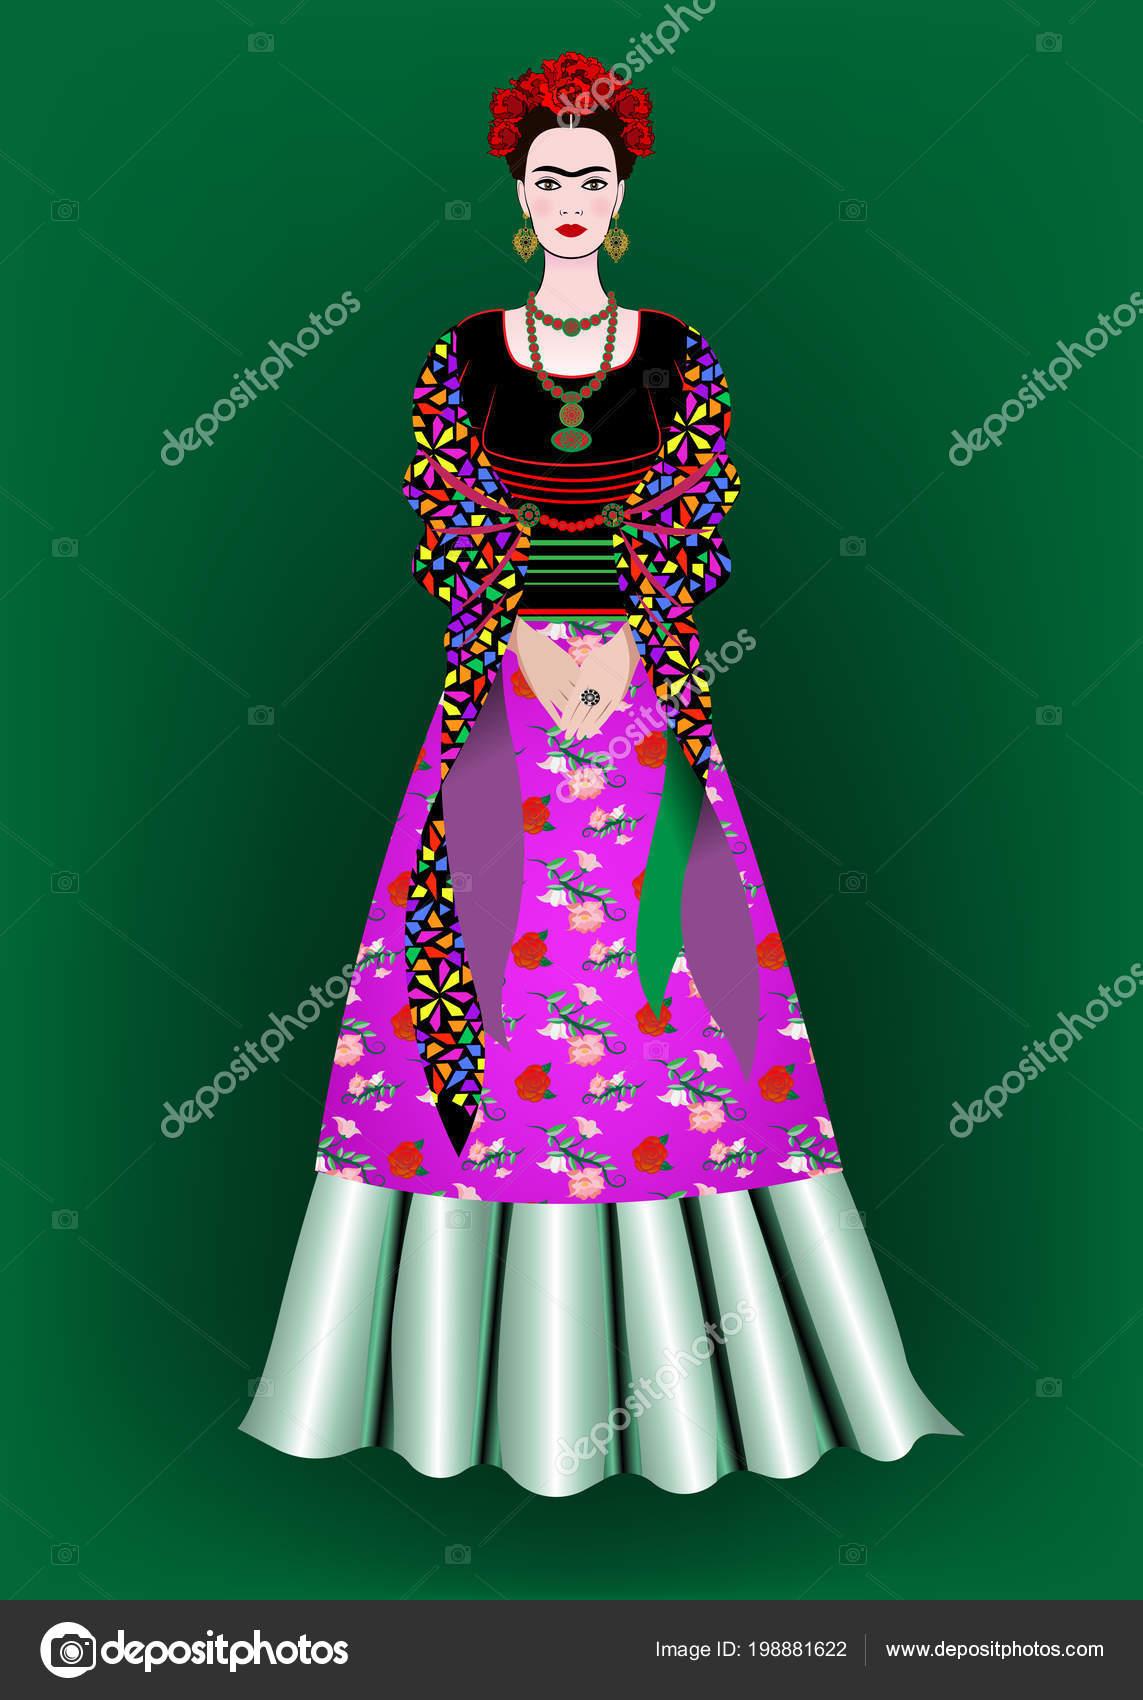 Retrato Vector Frida Kahlo Mujer Mexicana Con Peinado